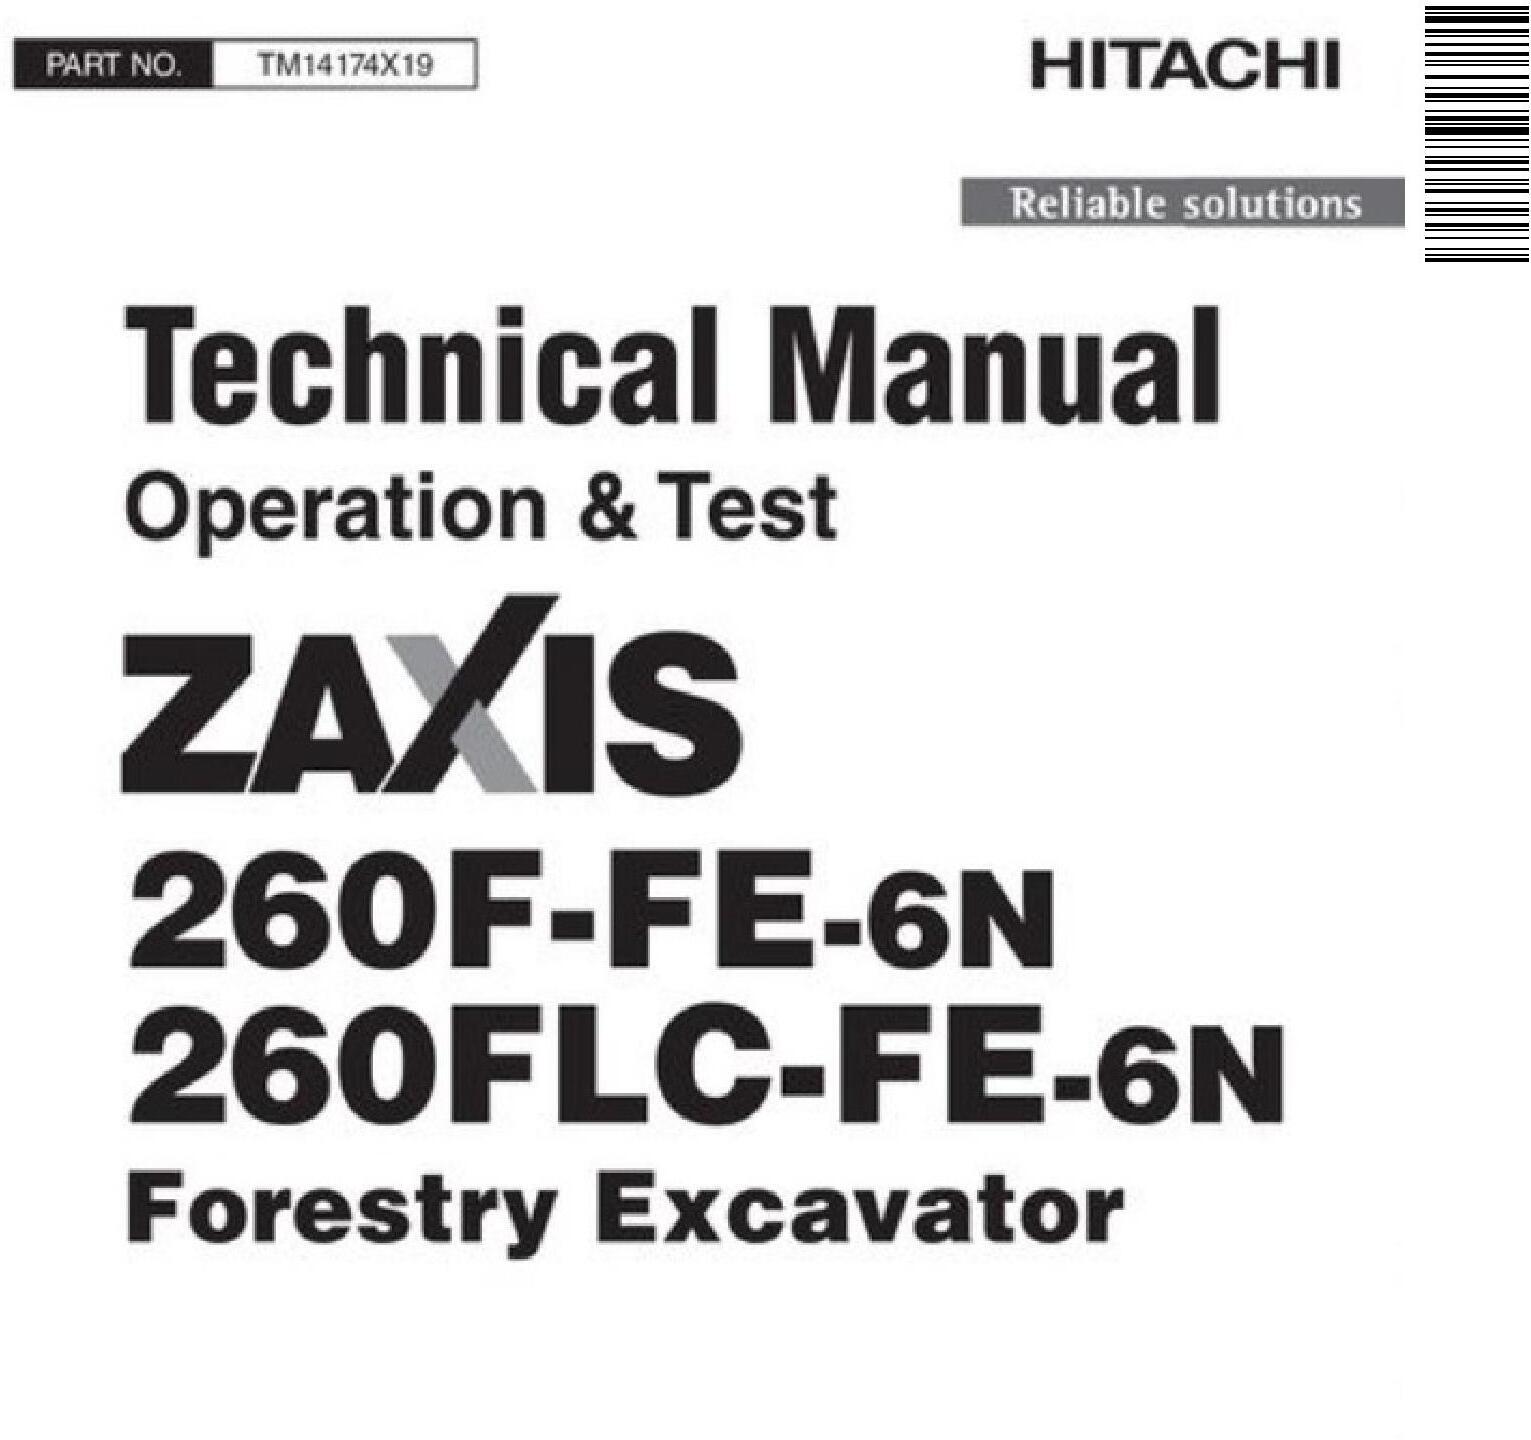 Hitachi Zaxis 260f Fe 6n 260flc Fe 6n Forestry Excavator